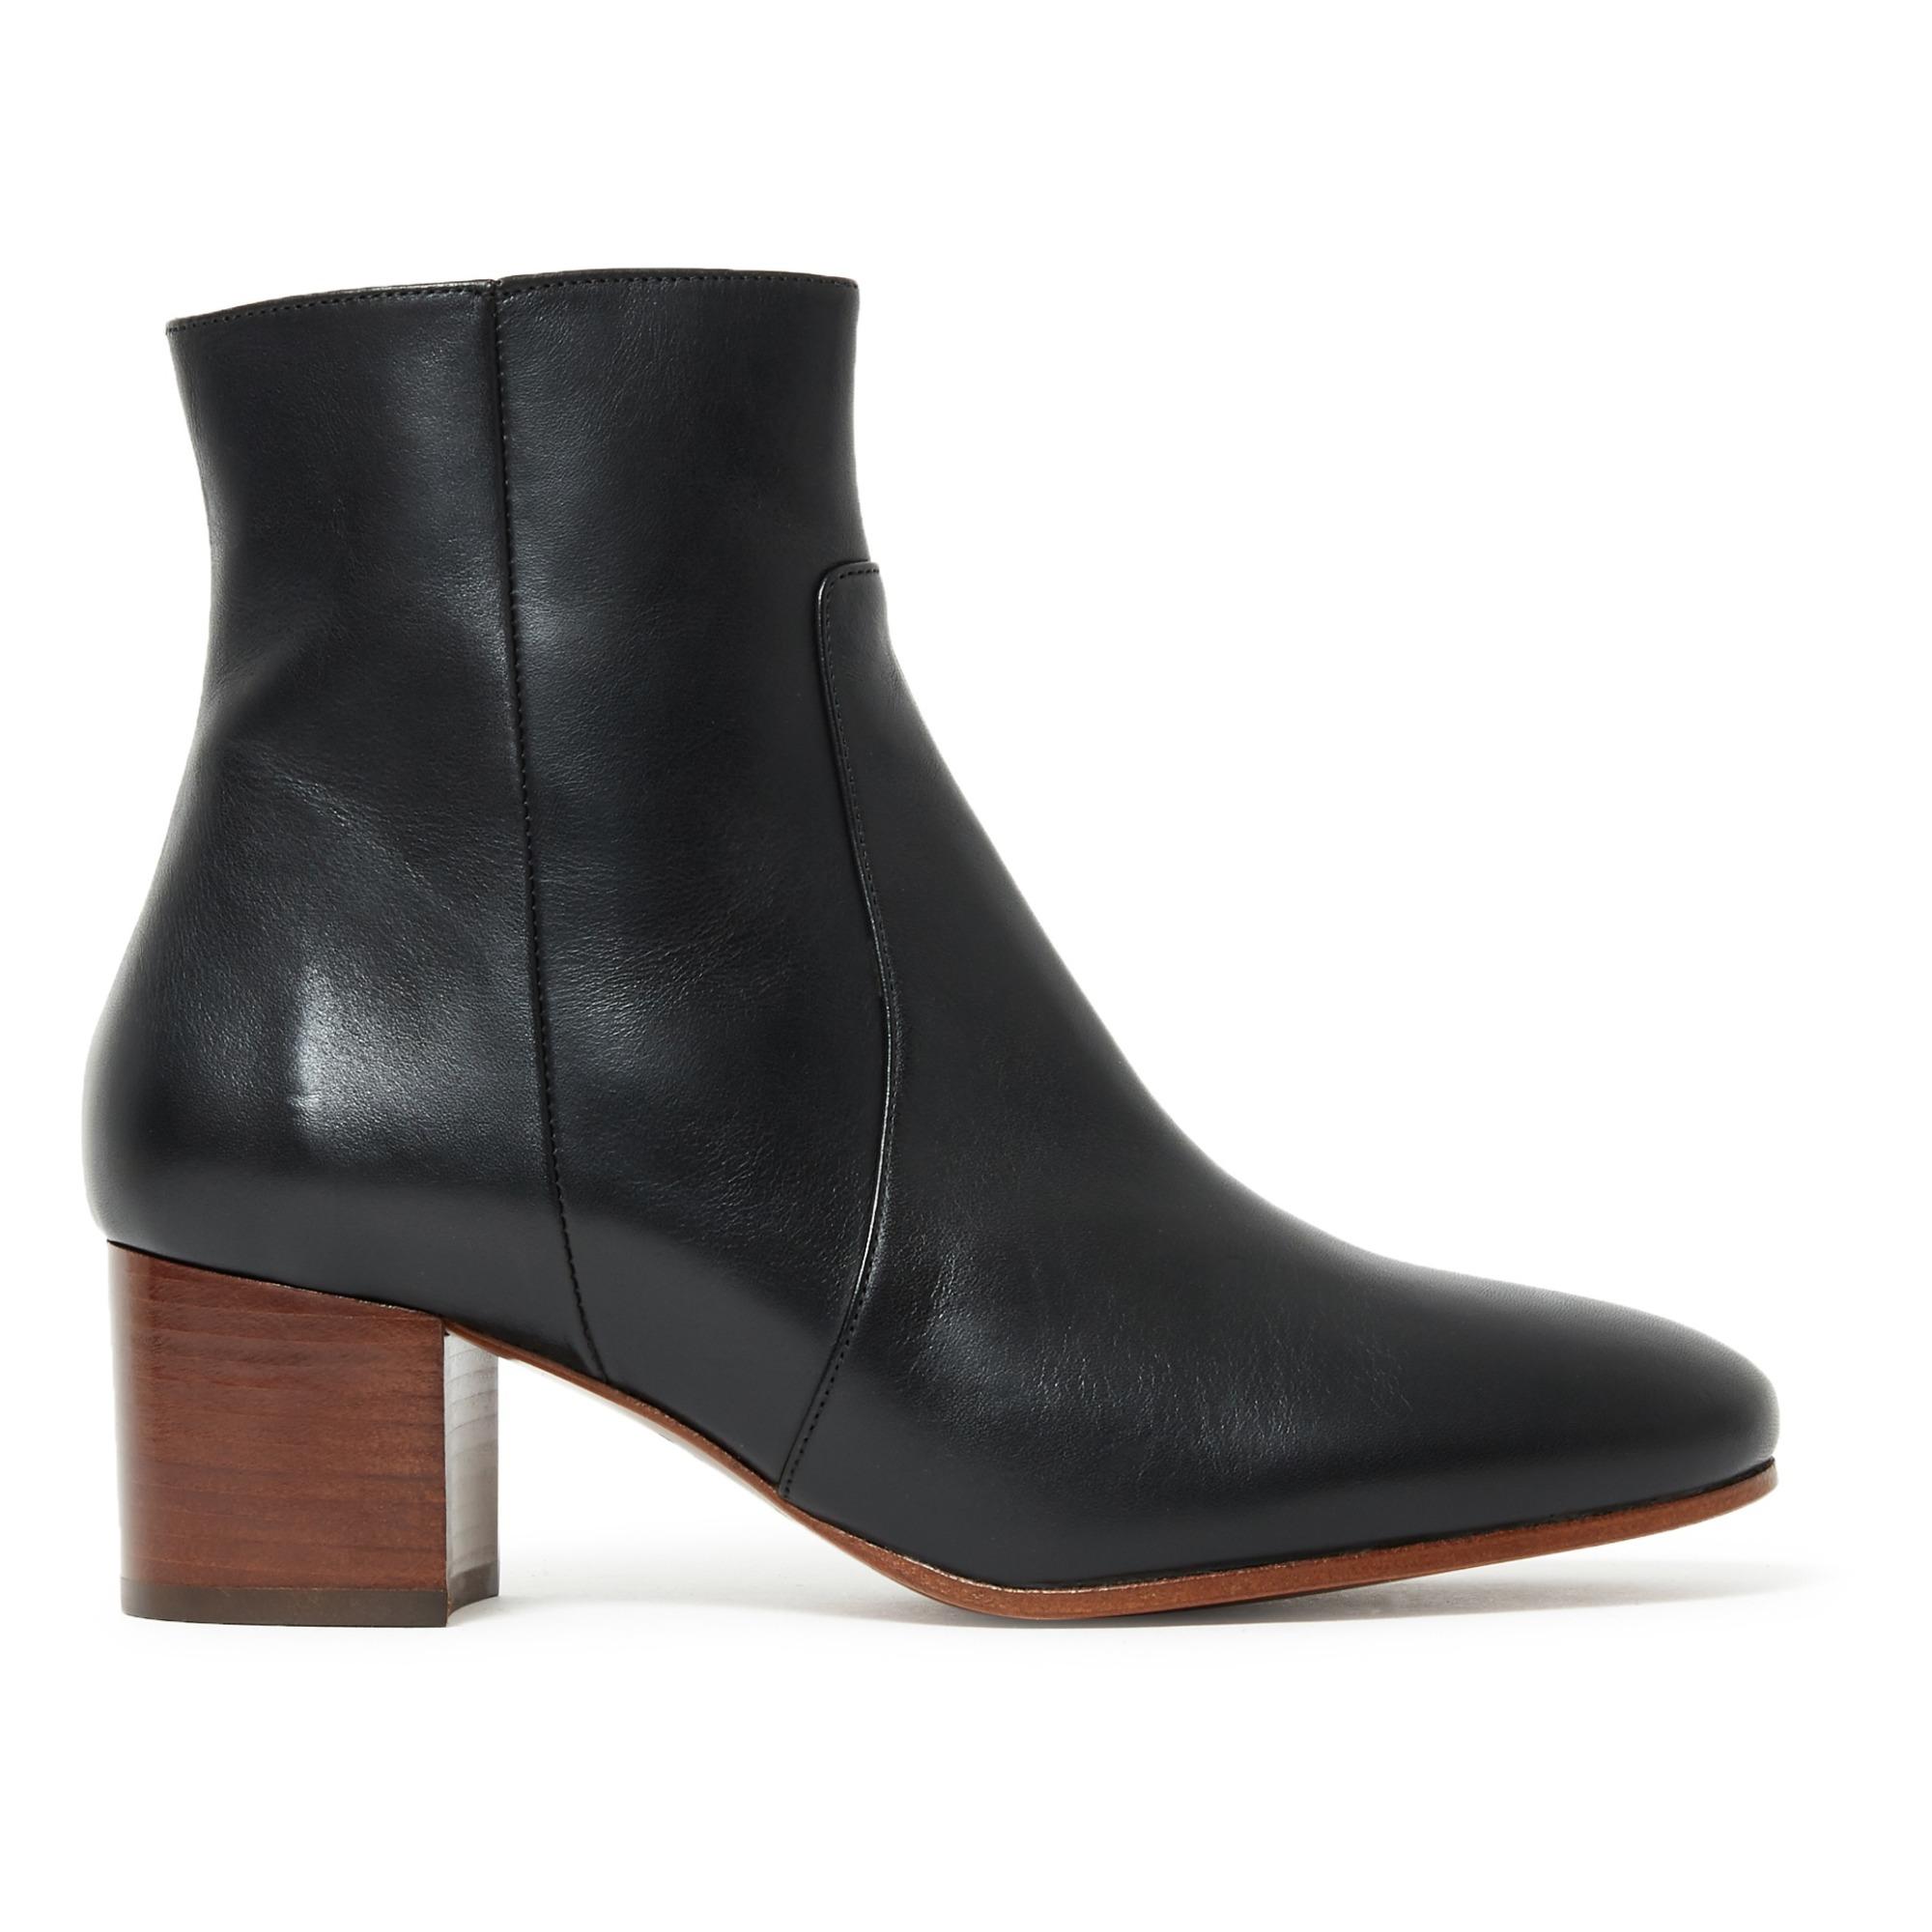 Bottine Cuir n°298 Noir Rivecour Chaussure Adulte